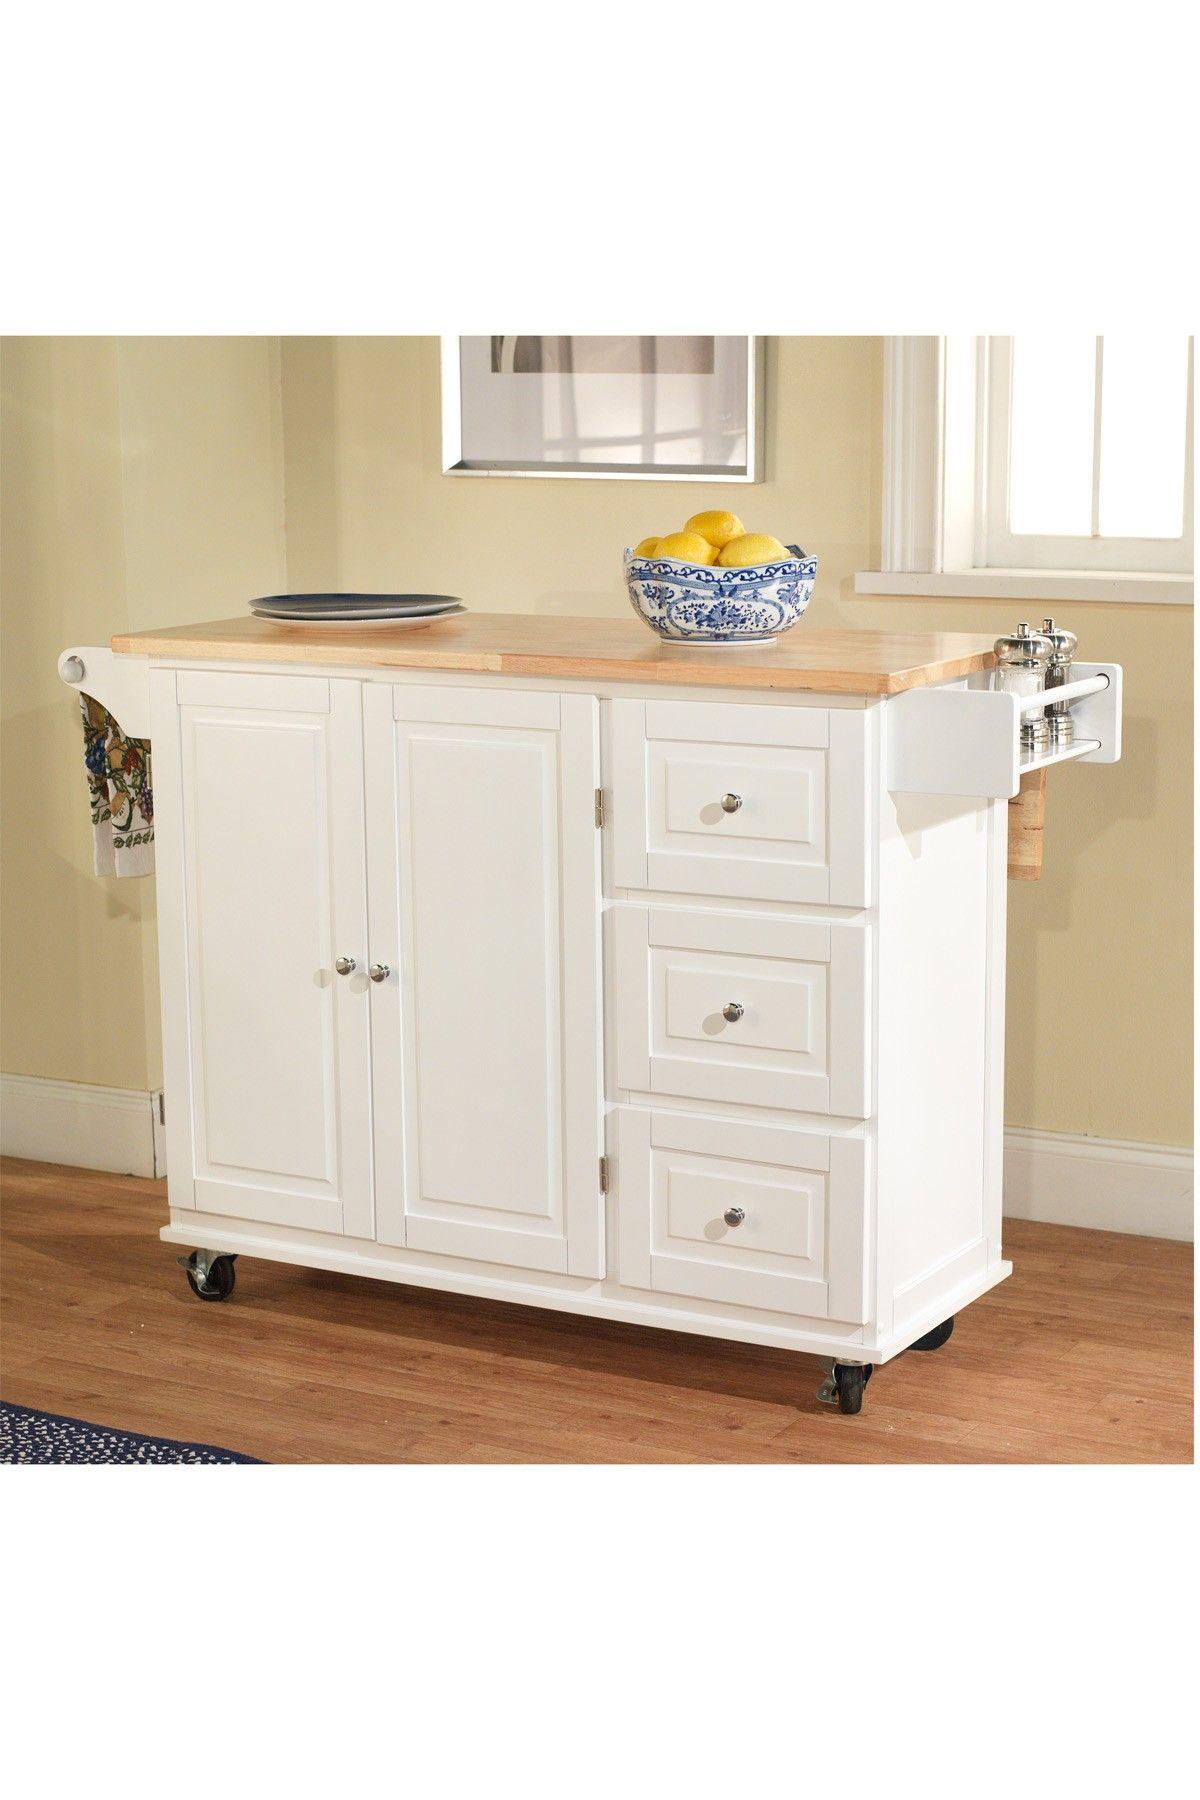 white sundance kitchen cart | kitchen cart, kitchen island